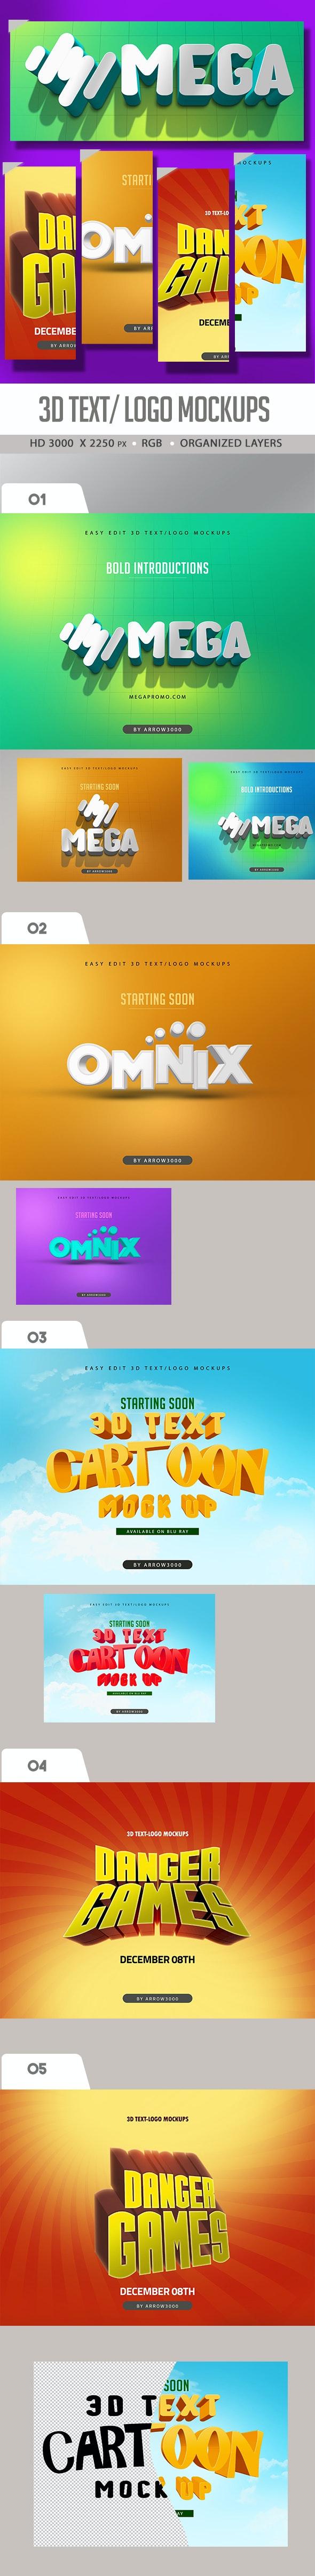 3D Text, logo Mock ups/ Cartoon Text Effects - Text Effects Actions